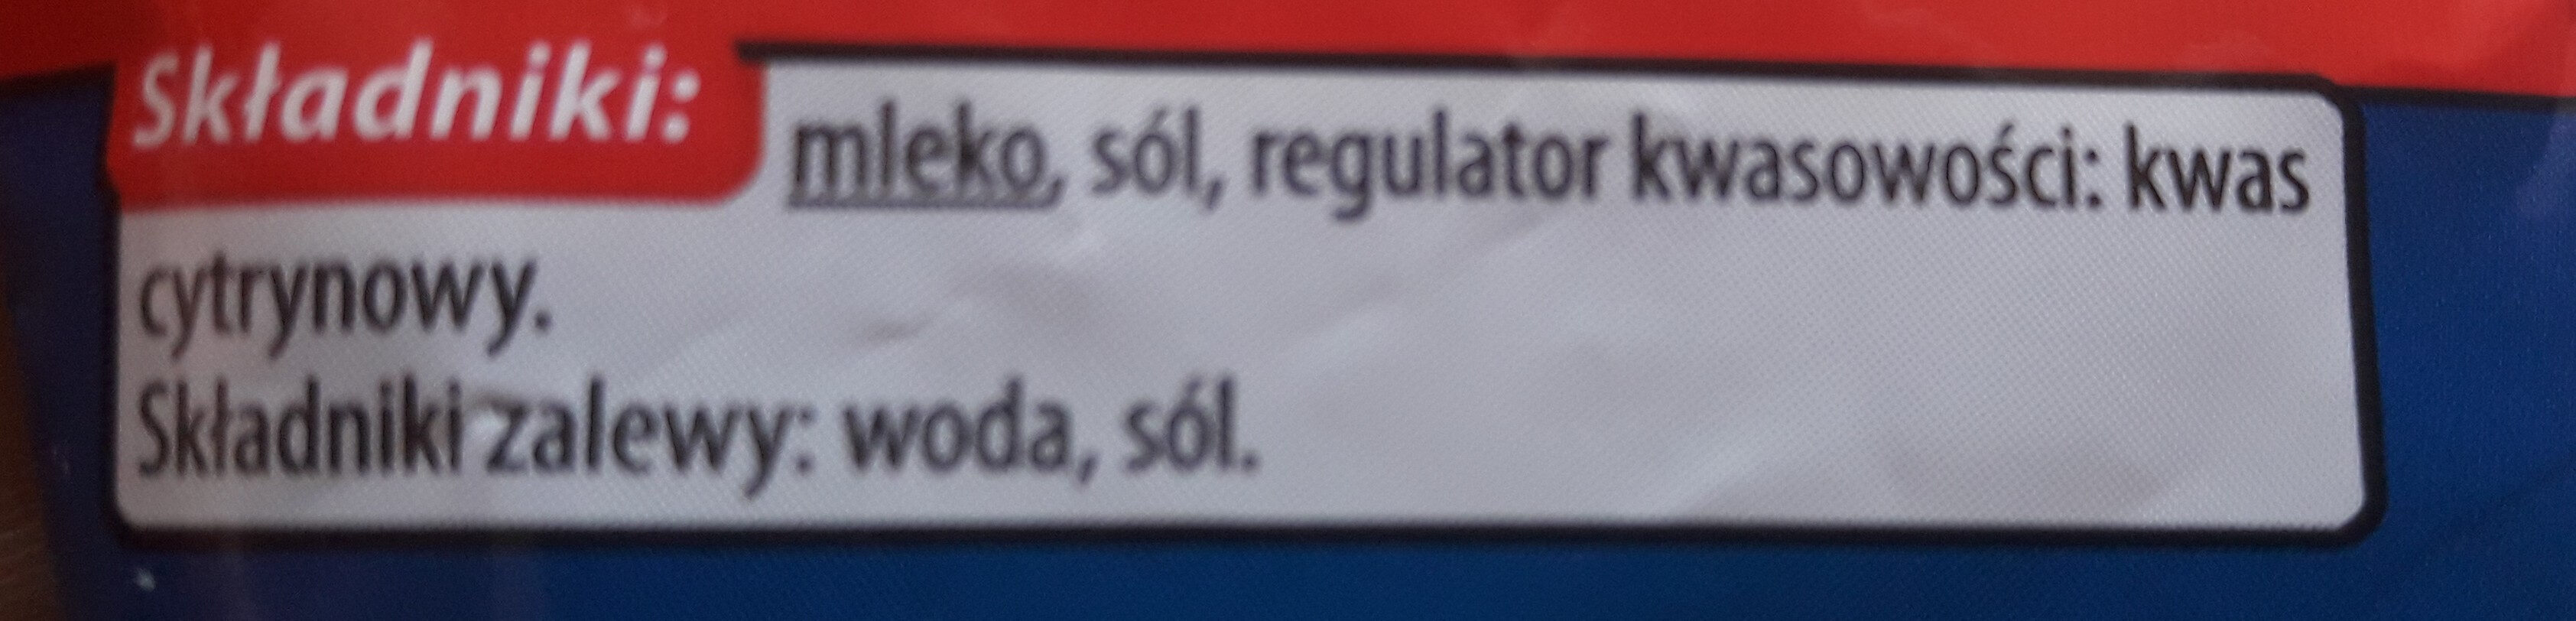 Mozzarella - Ingredients - pl